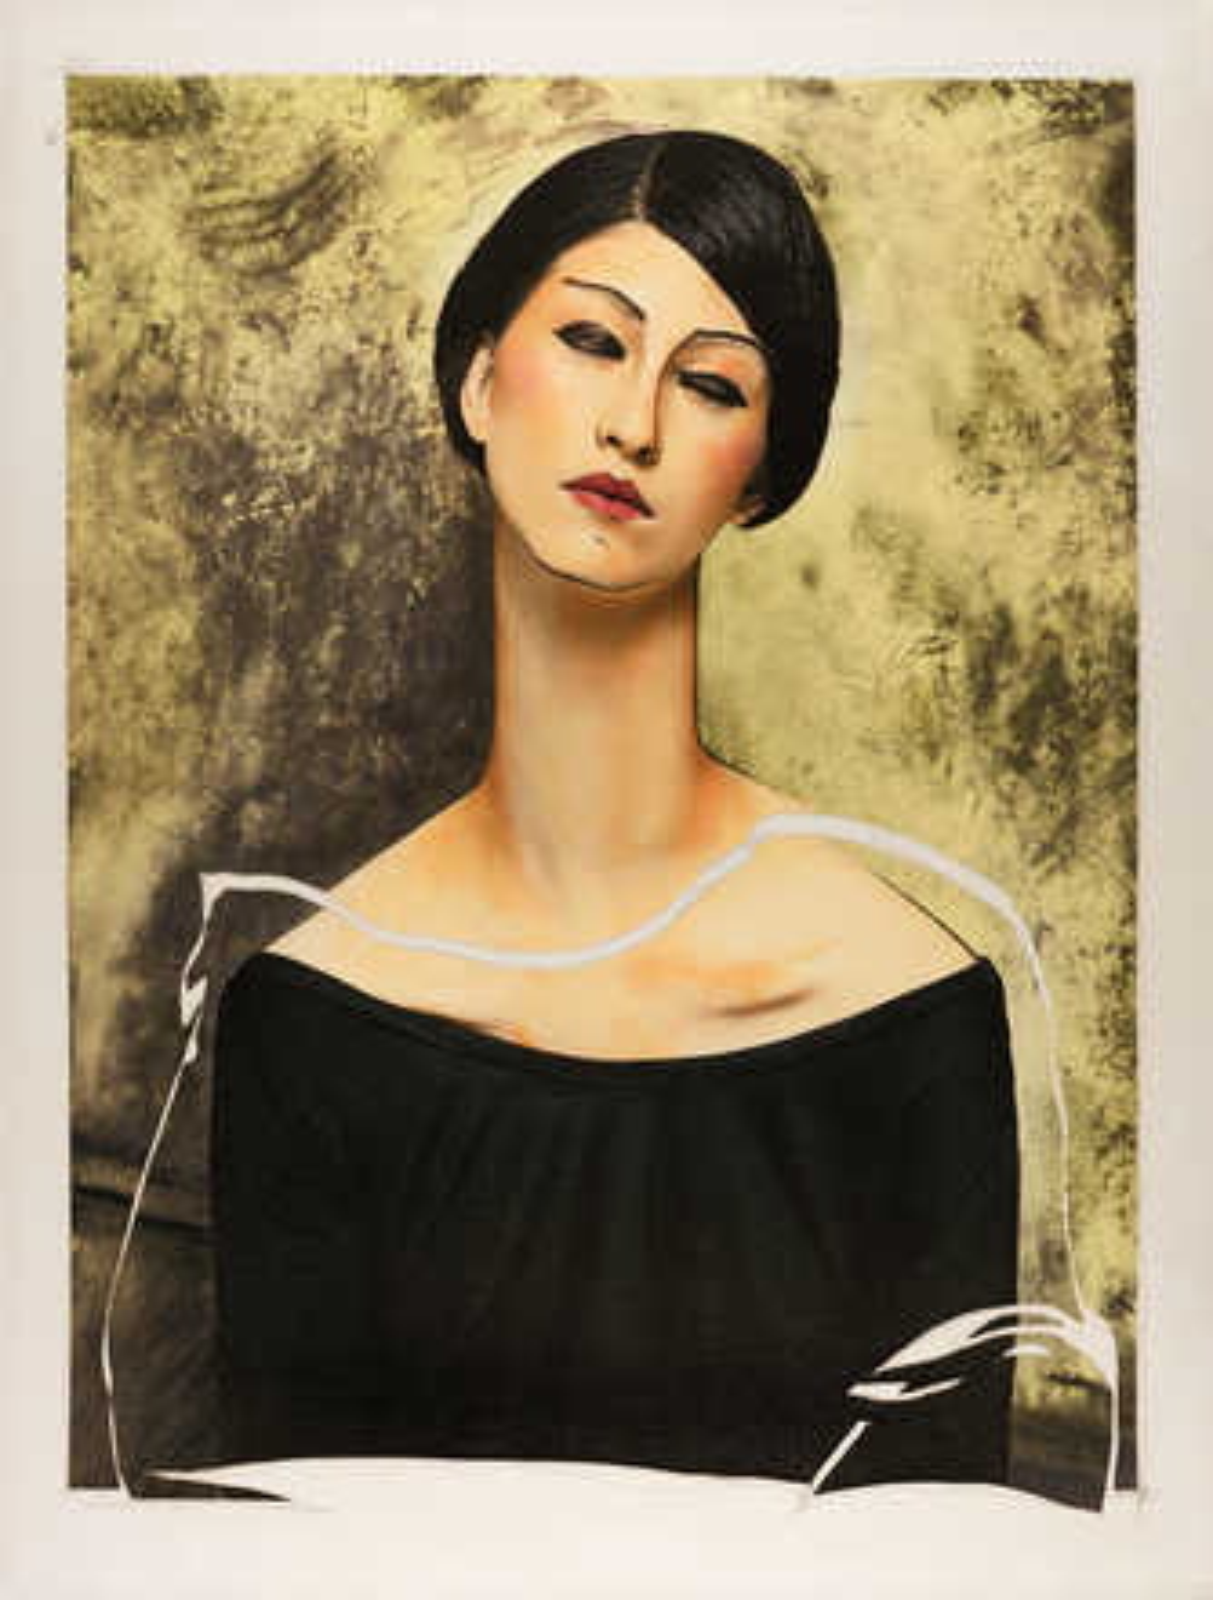 Women VI (after Modigliani) - Efren Isaza